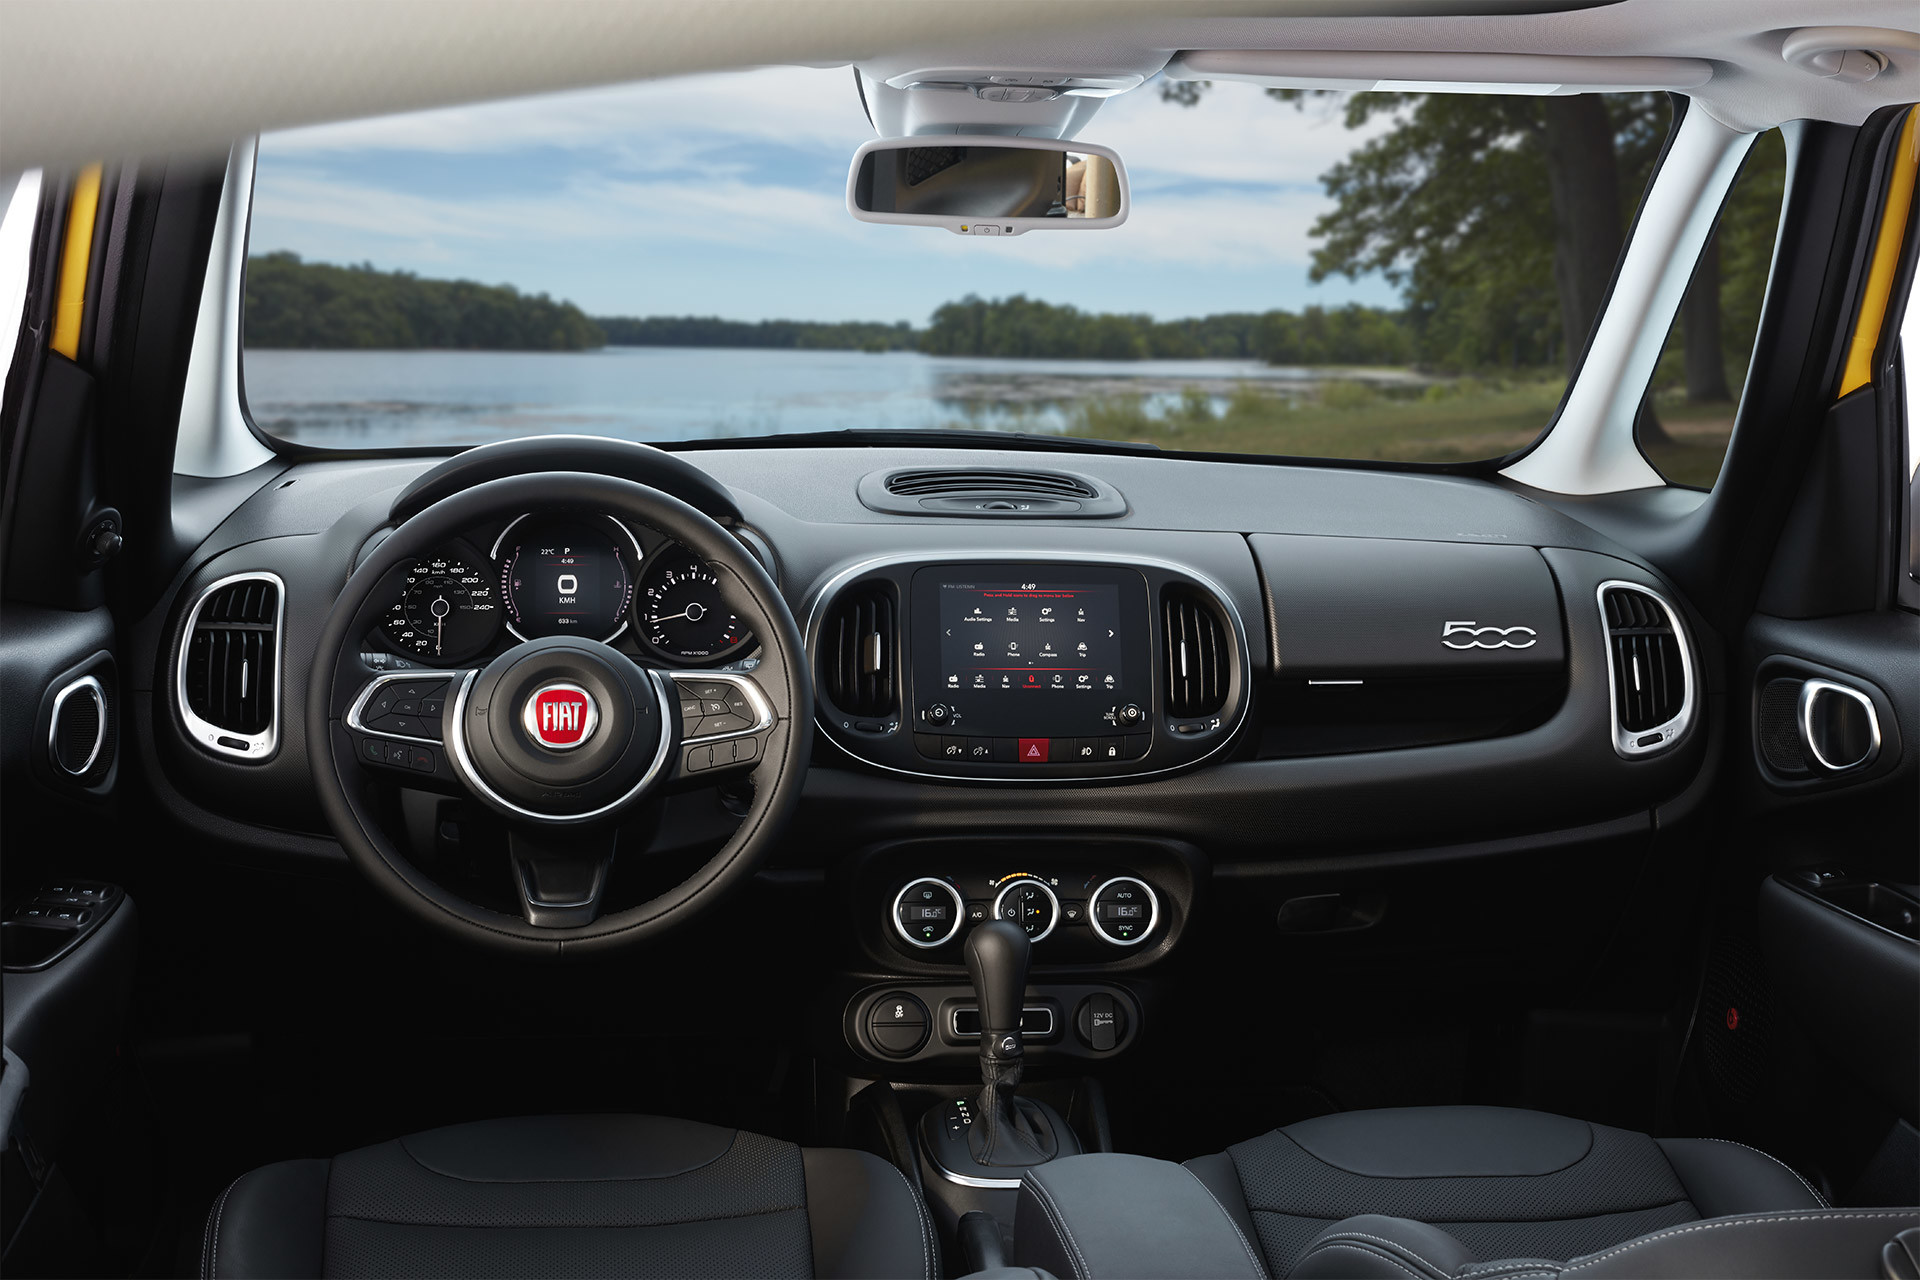 2019 FIAT 500L | FIAT Canada